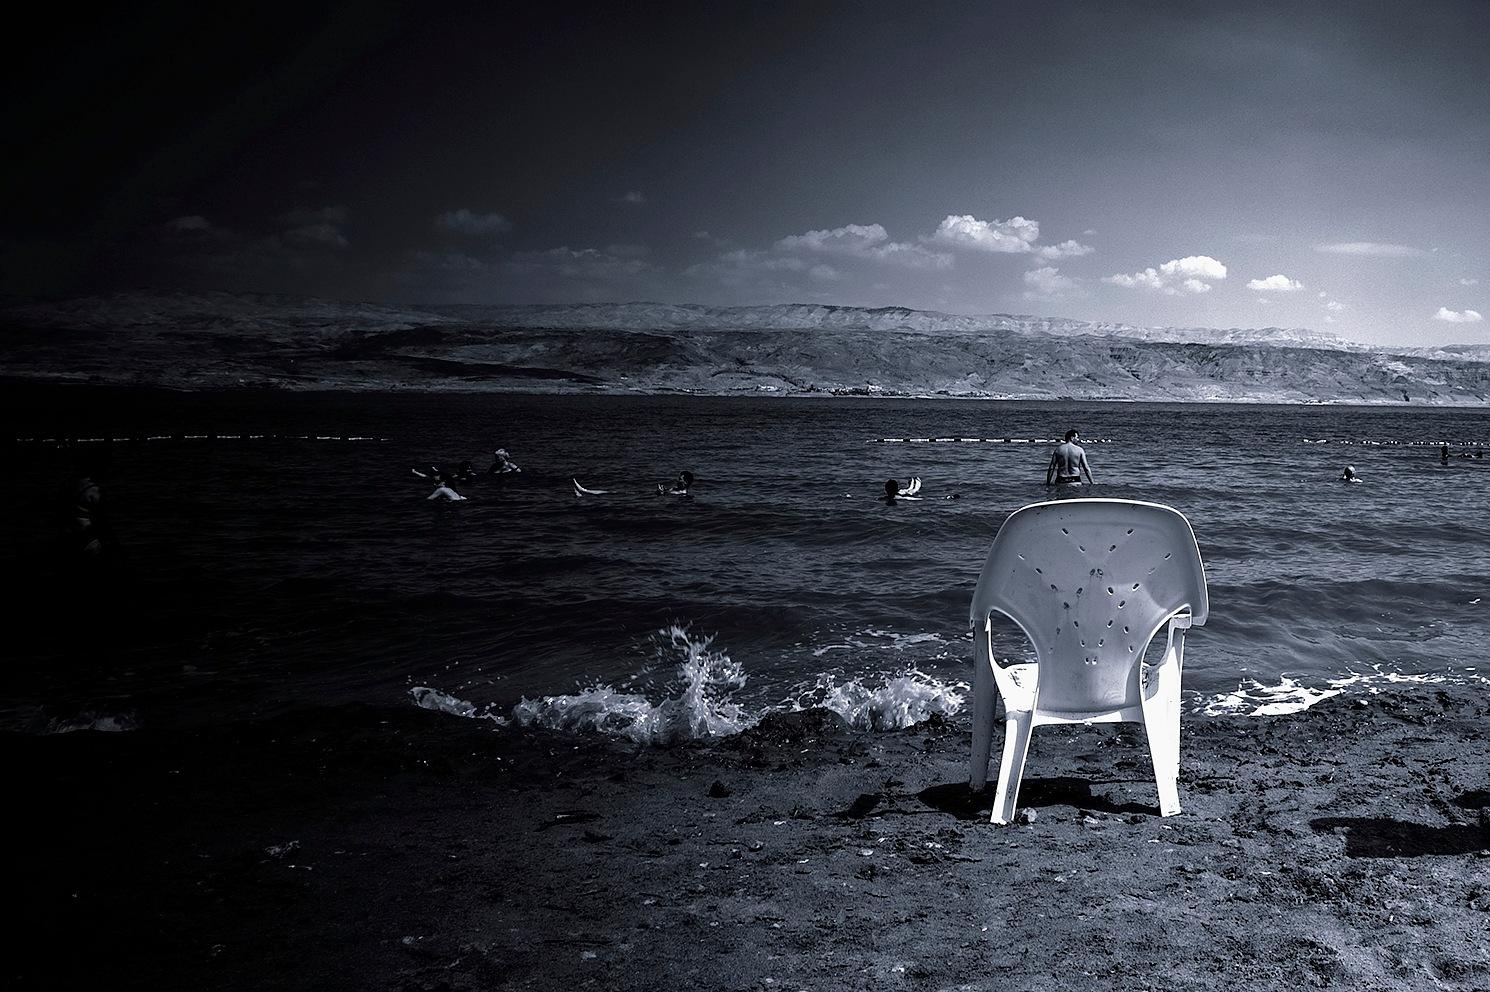 Morze Martwe by zbych41